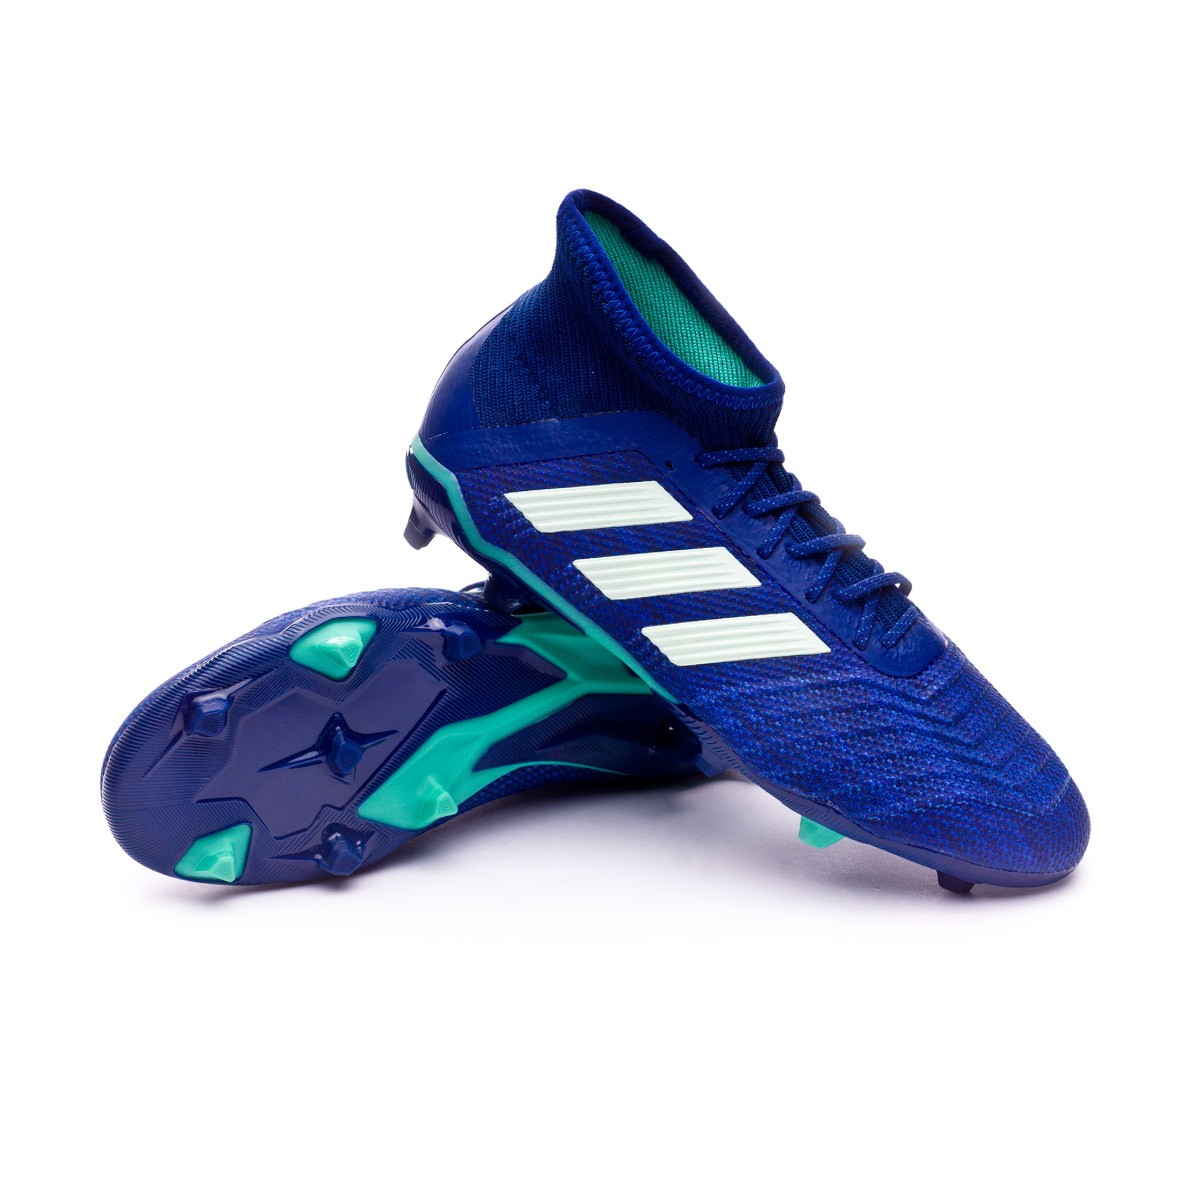 cd6b0af6ed4 adidas Kids Predator 18.1 FG Football Boots. Unity ink-Aero green-Hi-res ...